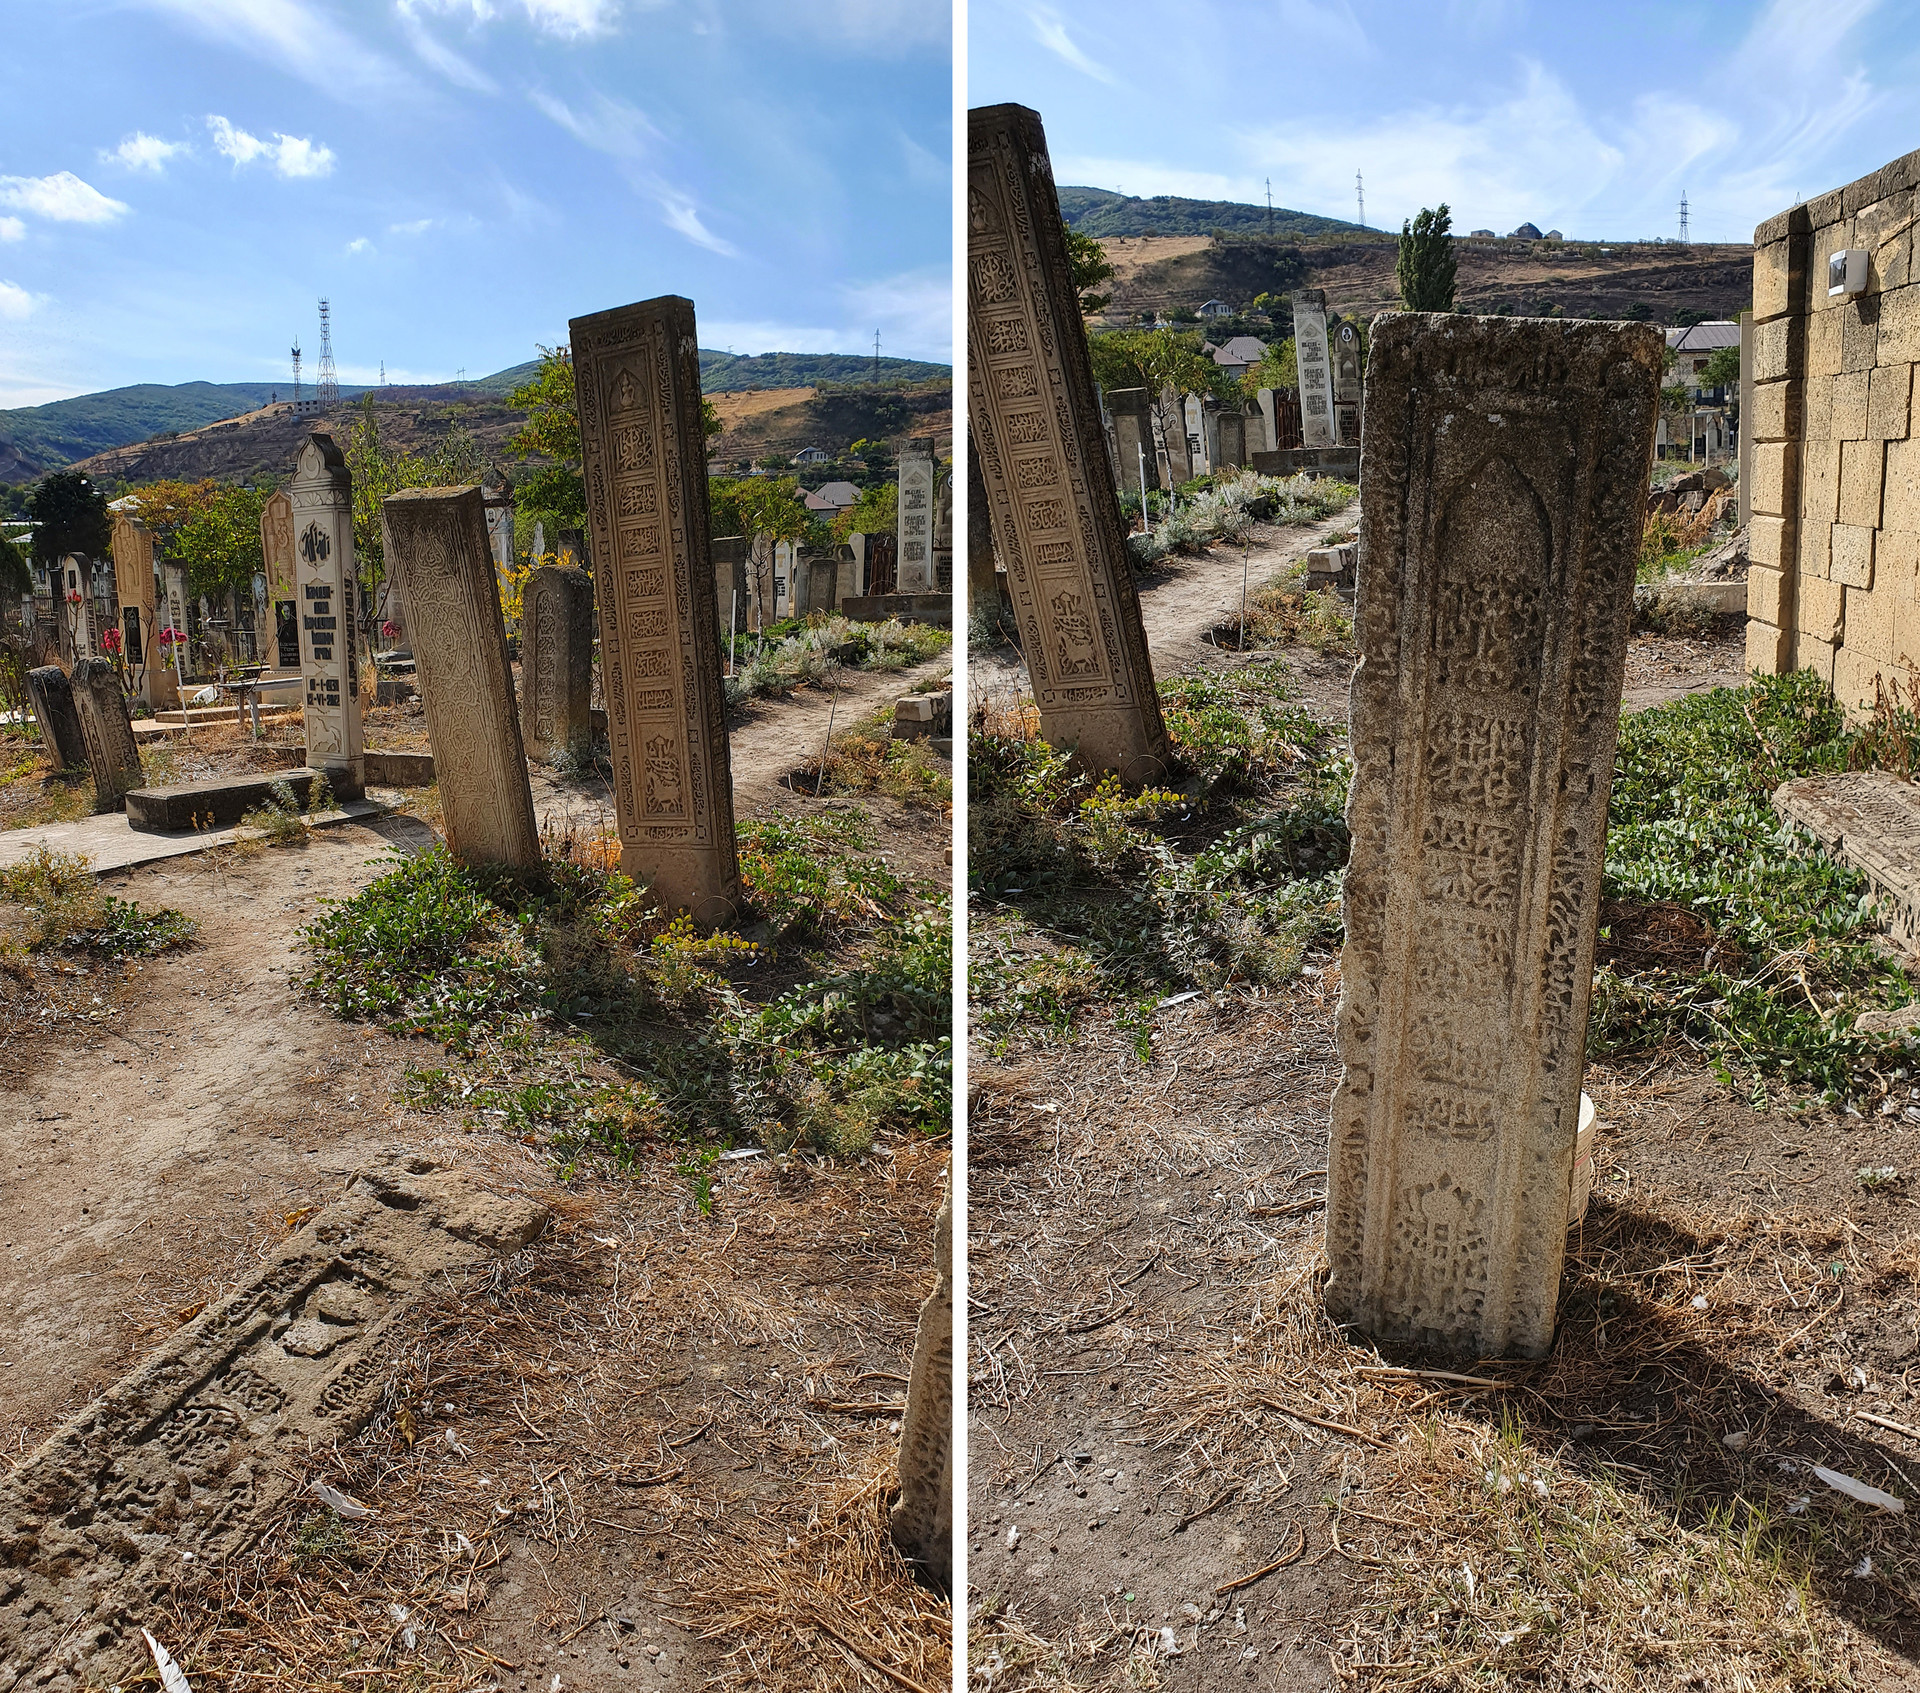 Batu-batu nisan di tanah pemakaman Derbent.